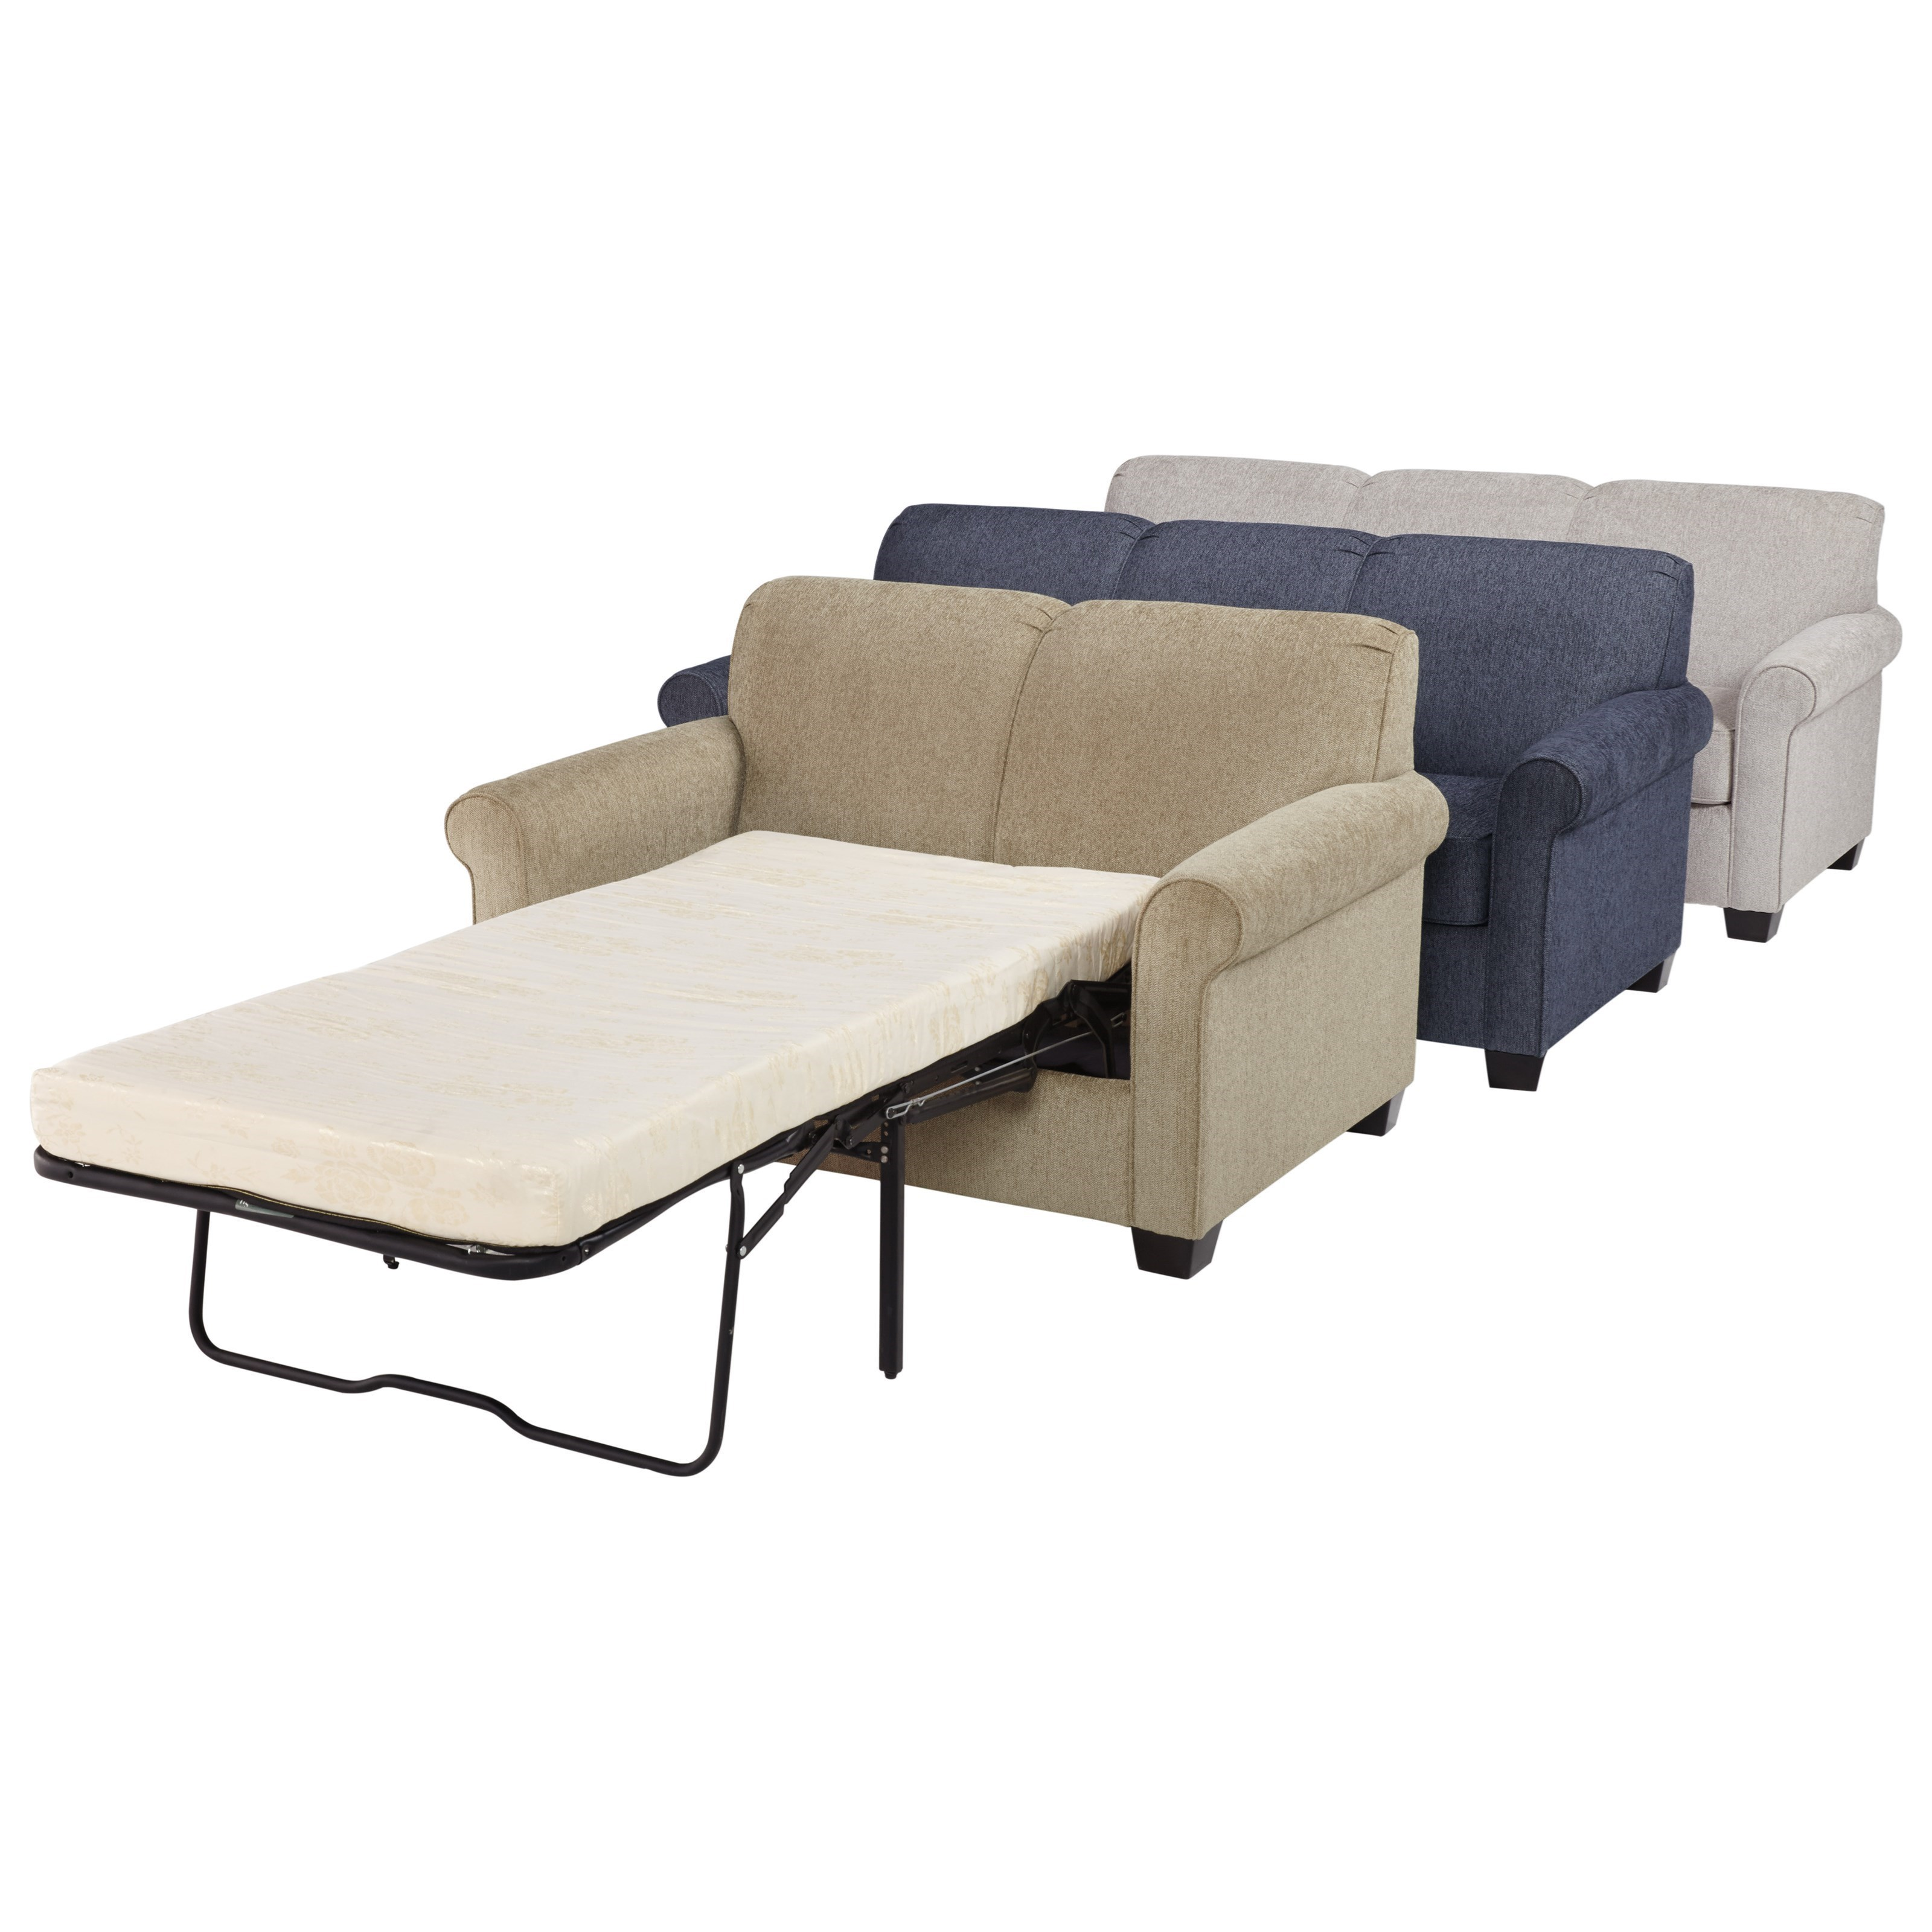 ... Ashley Signature Design Cansler Twin Sleeper Sofa